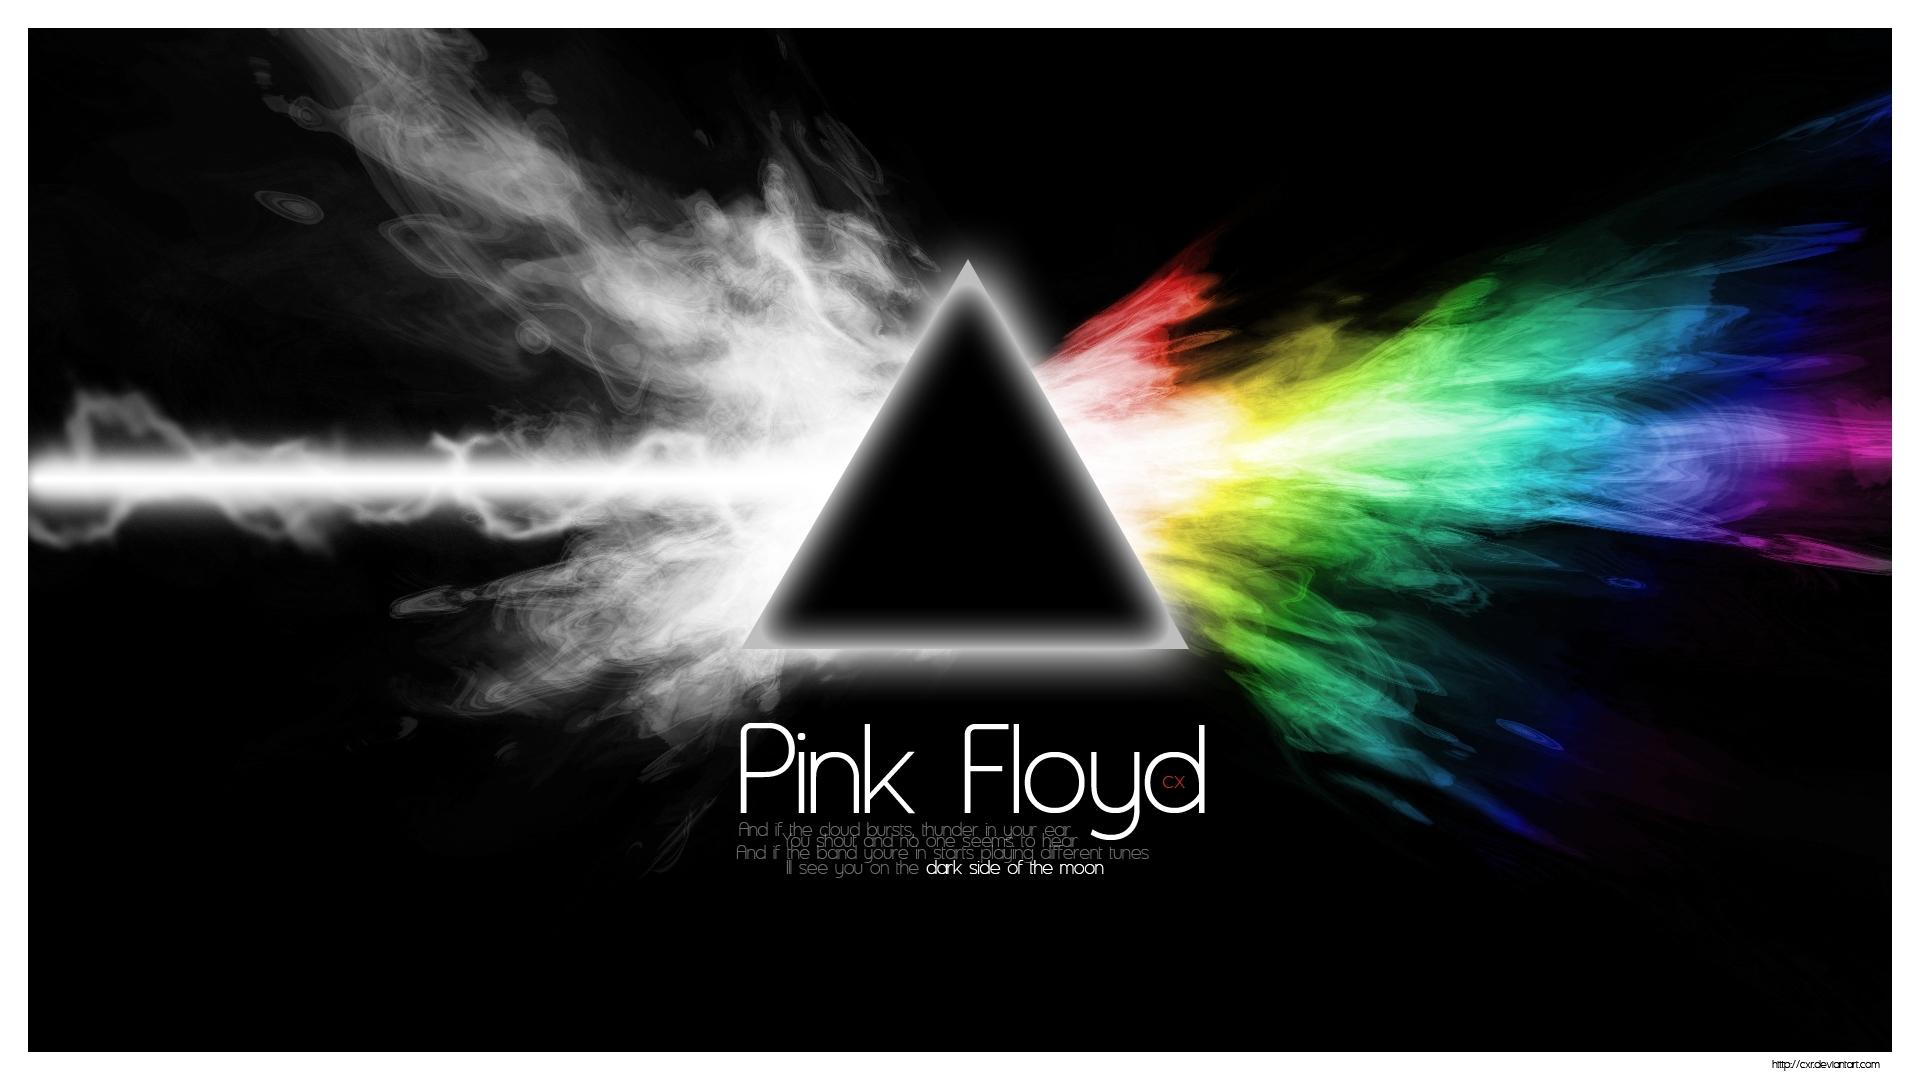 Free Download Full Hd Wallpaper Pink Floyd Rainbow Triangle